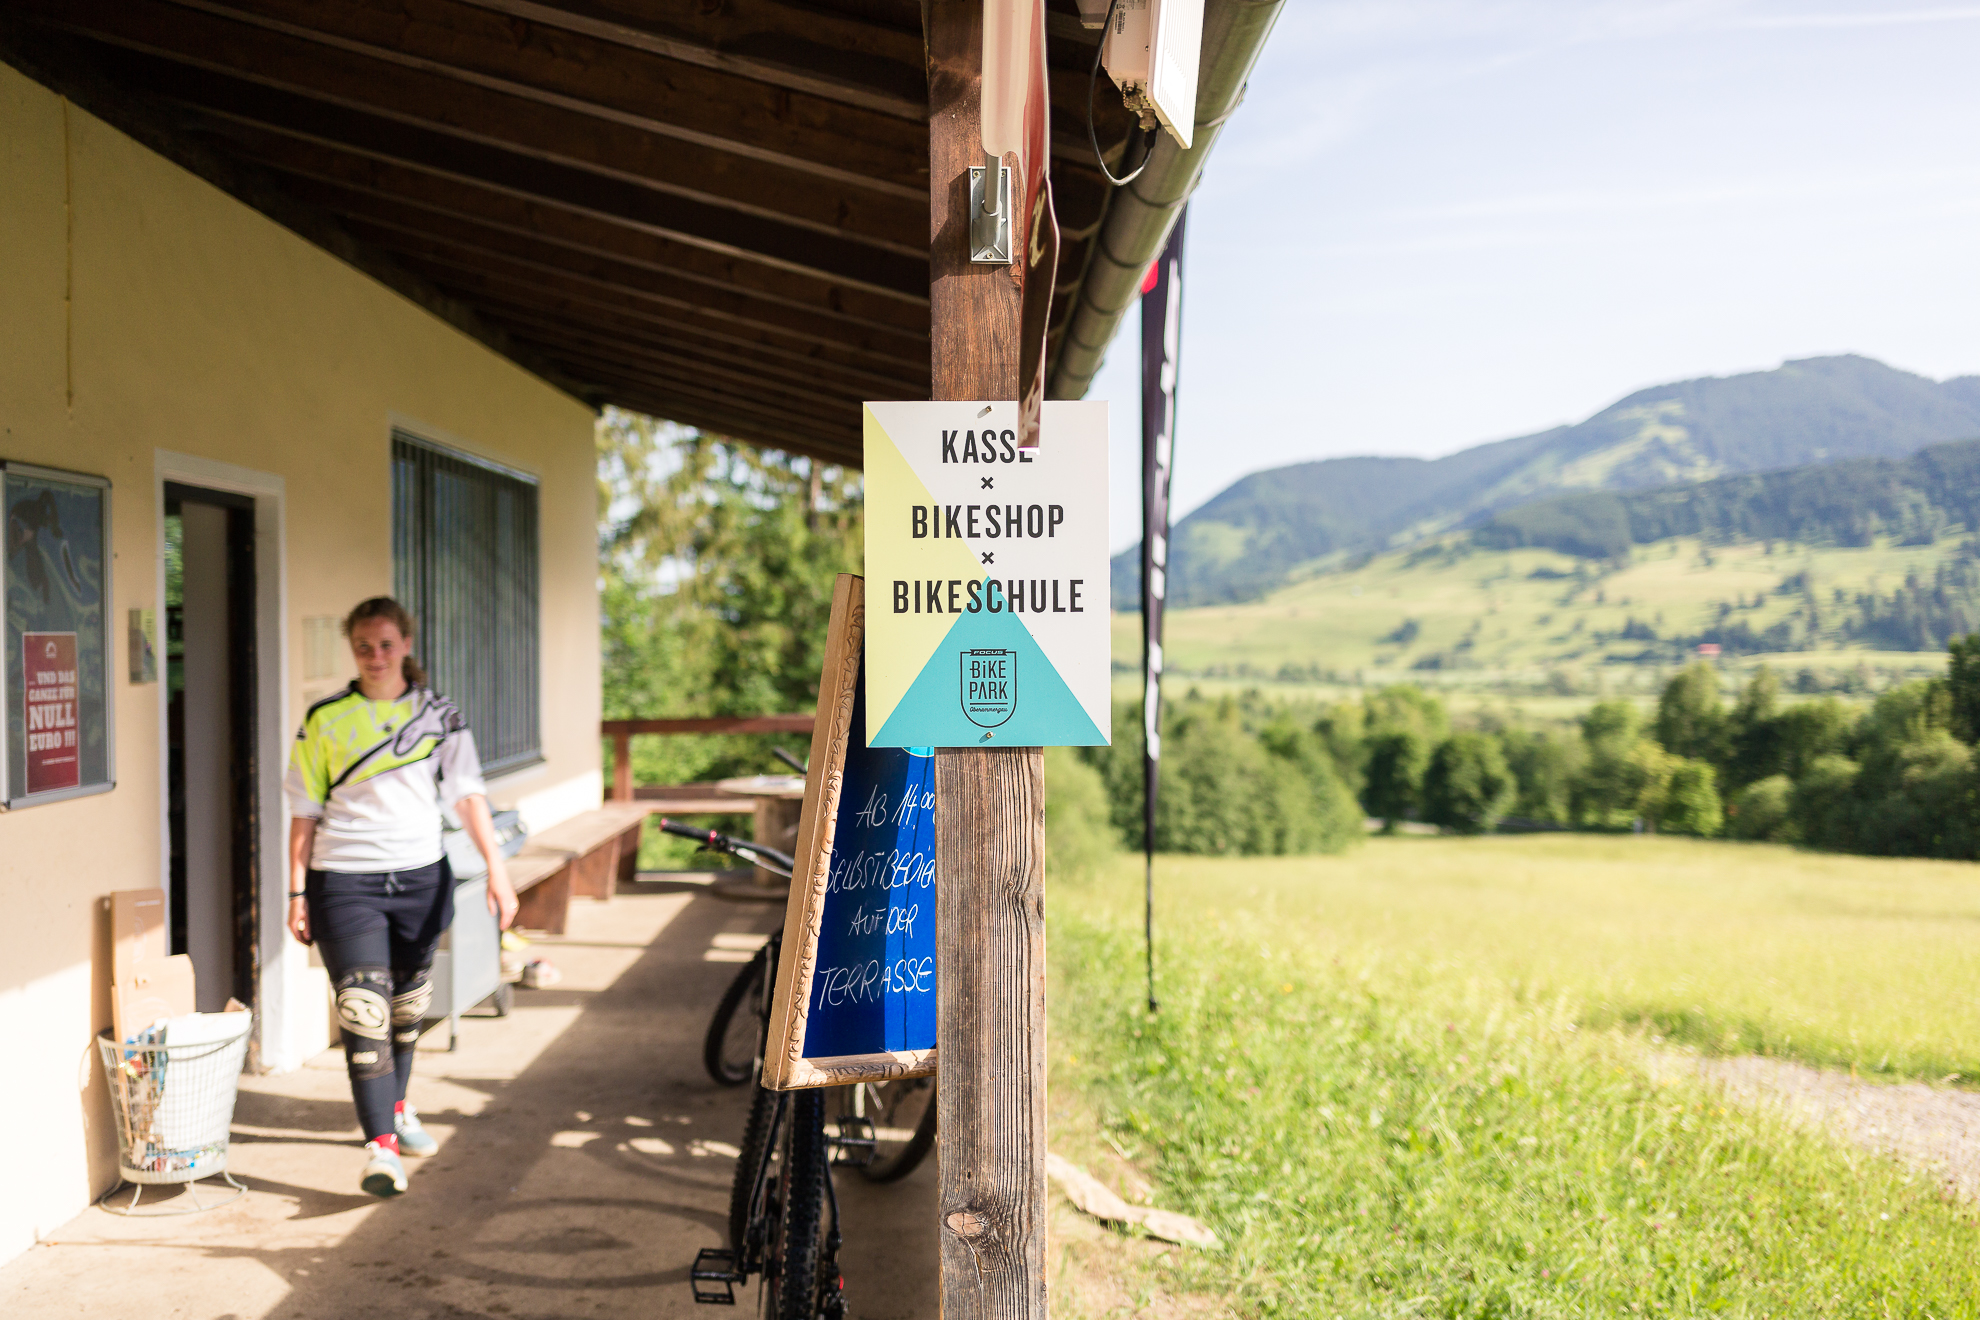 AB_20180611_Bikepark-Oberammergau_077-16.jpg